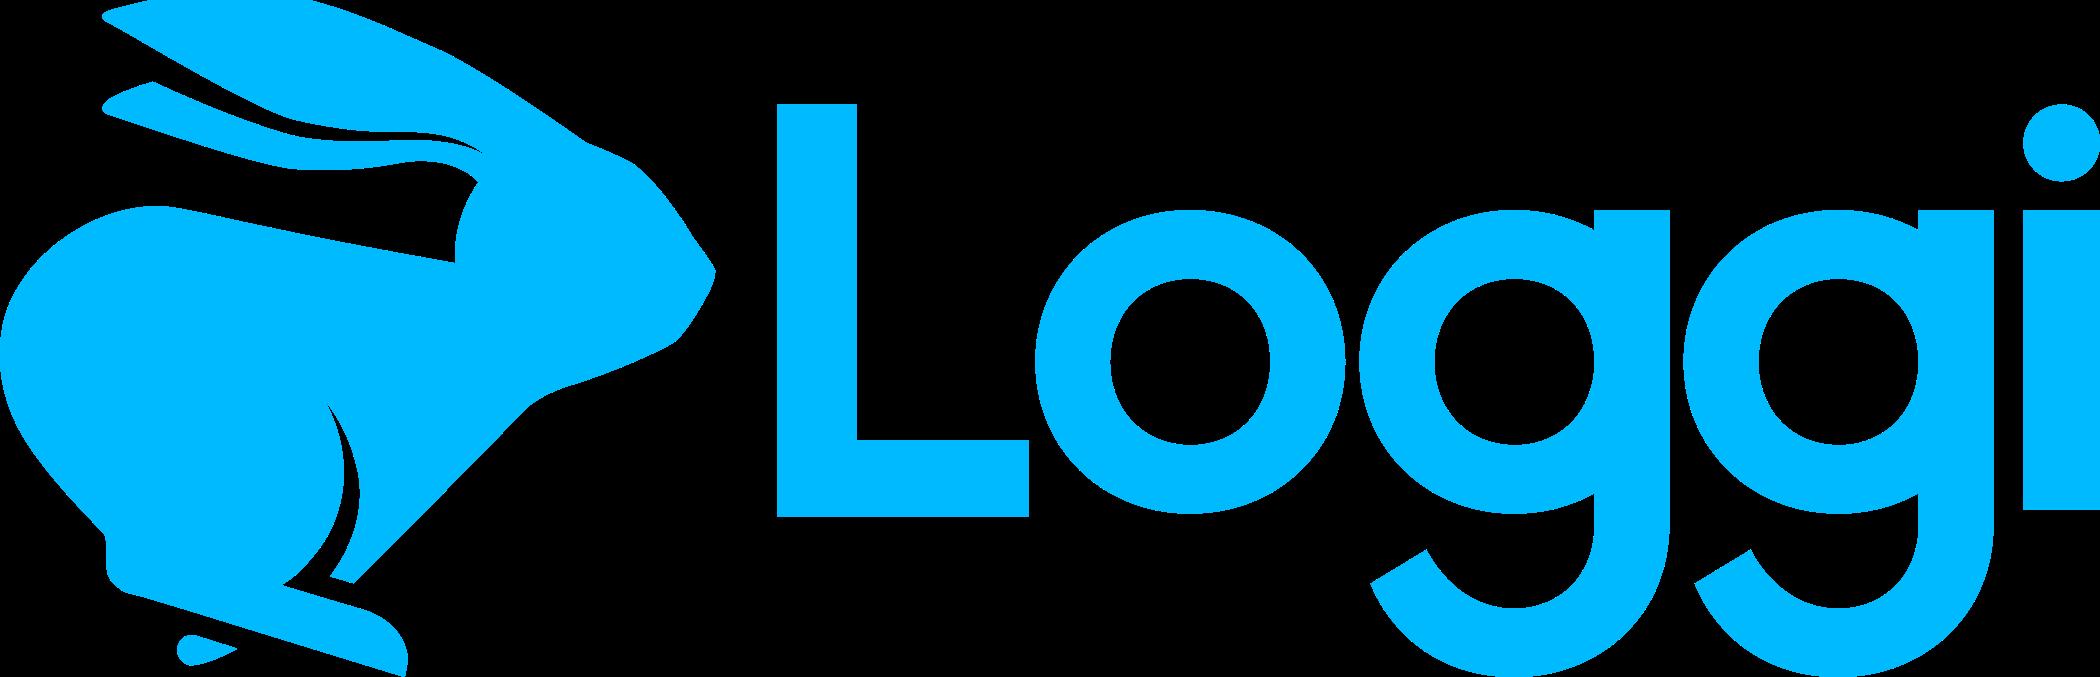 Loggi Logo.